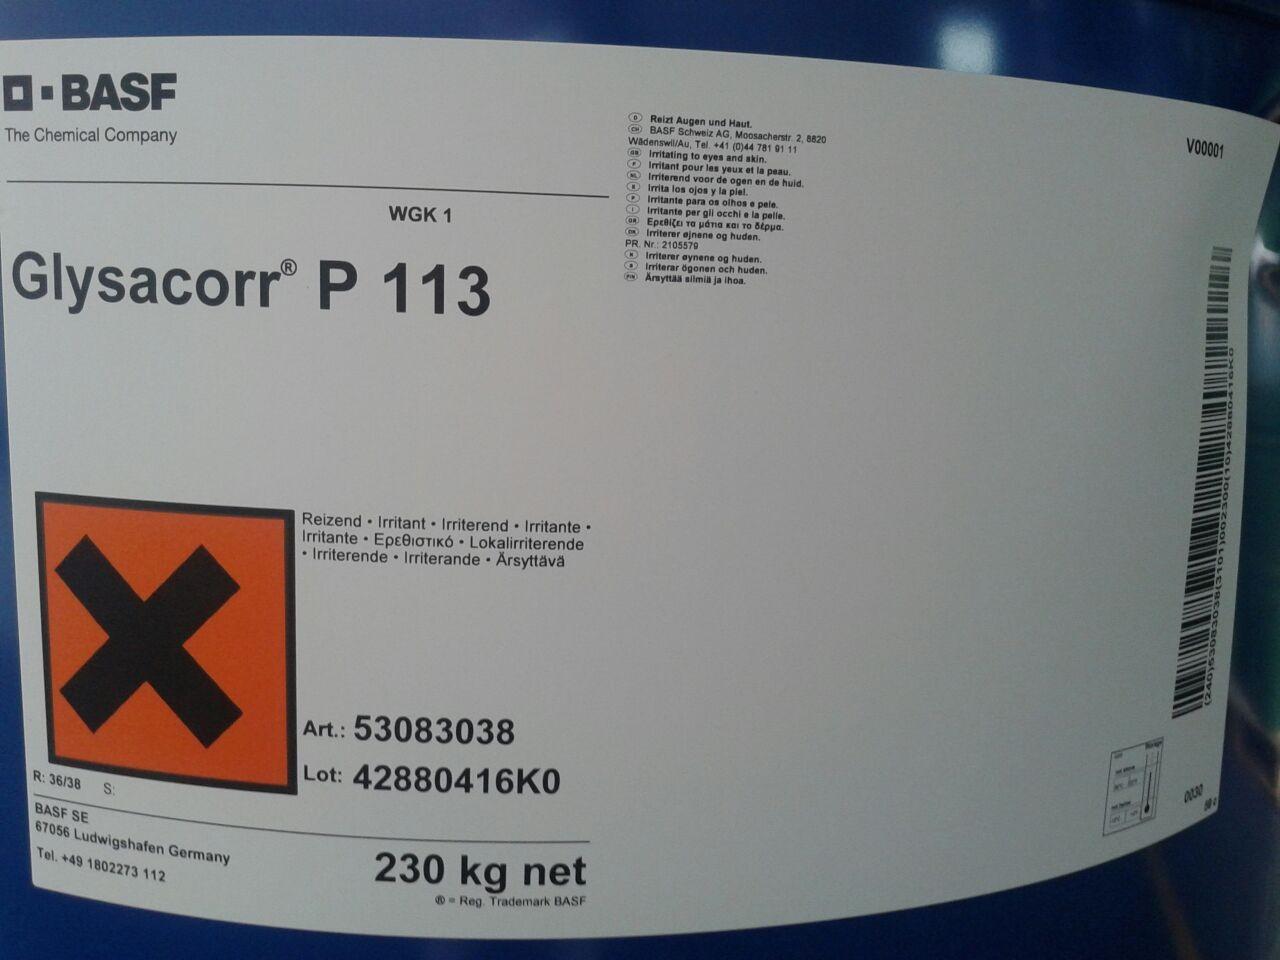 Glysacorr P113丨BASF腐蚀抑制剂缓蚀剂